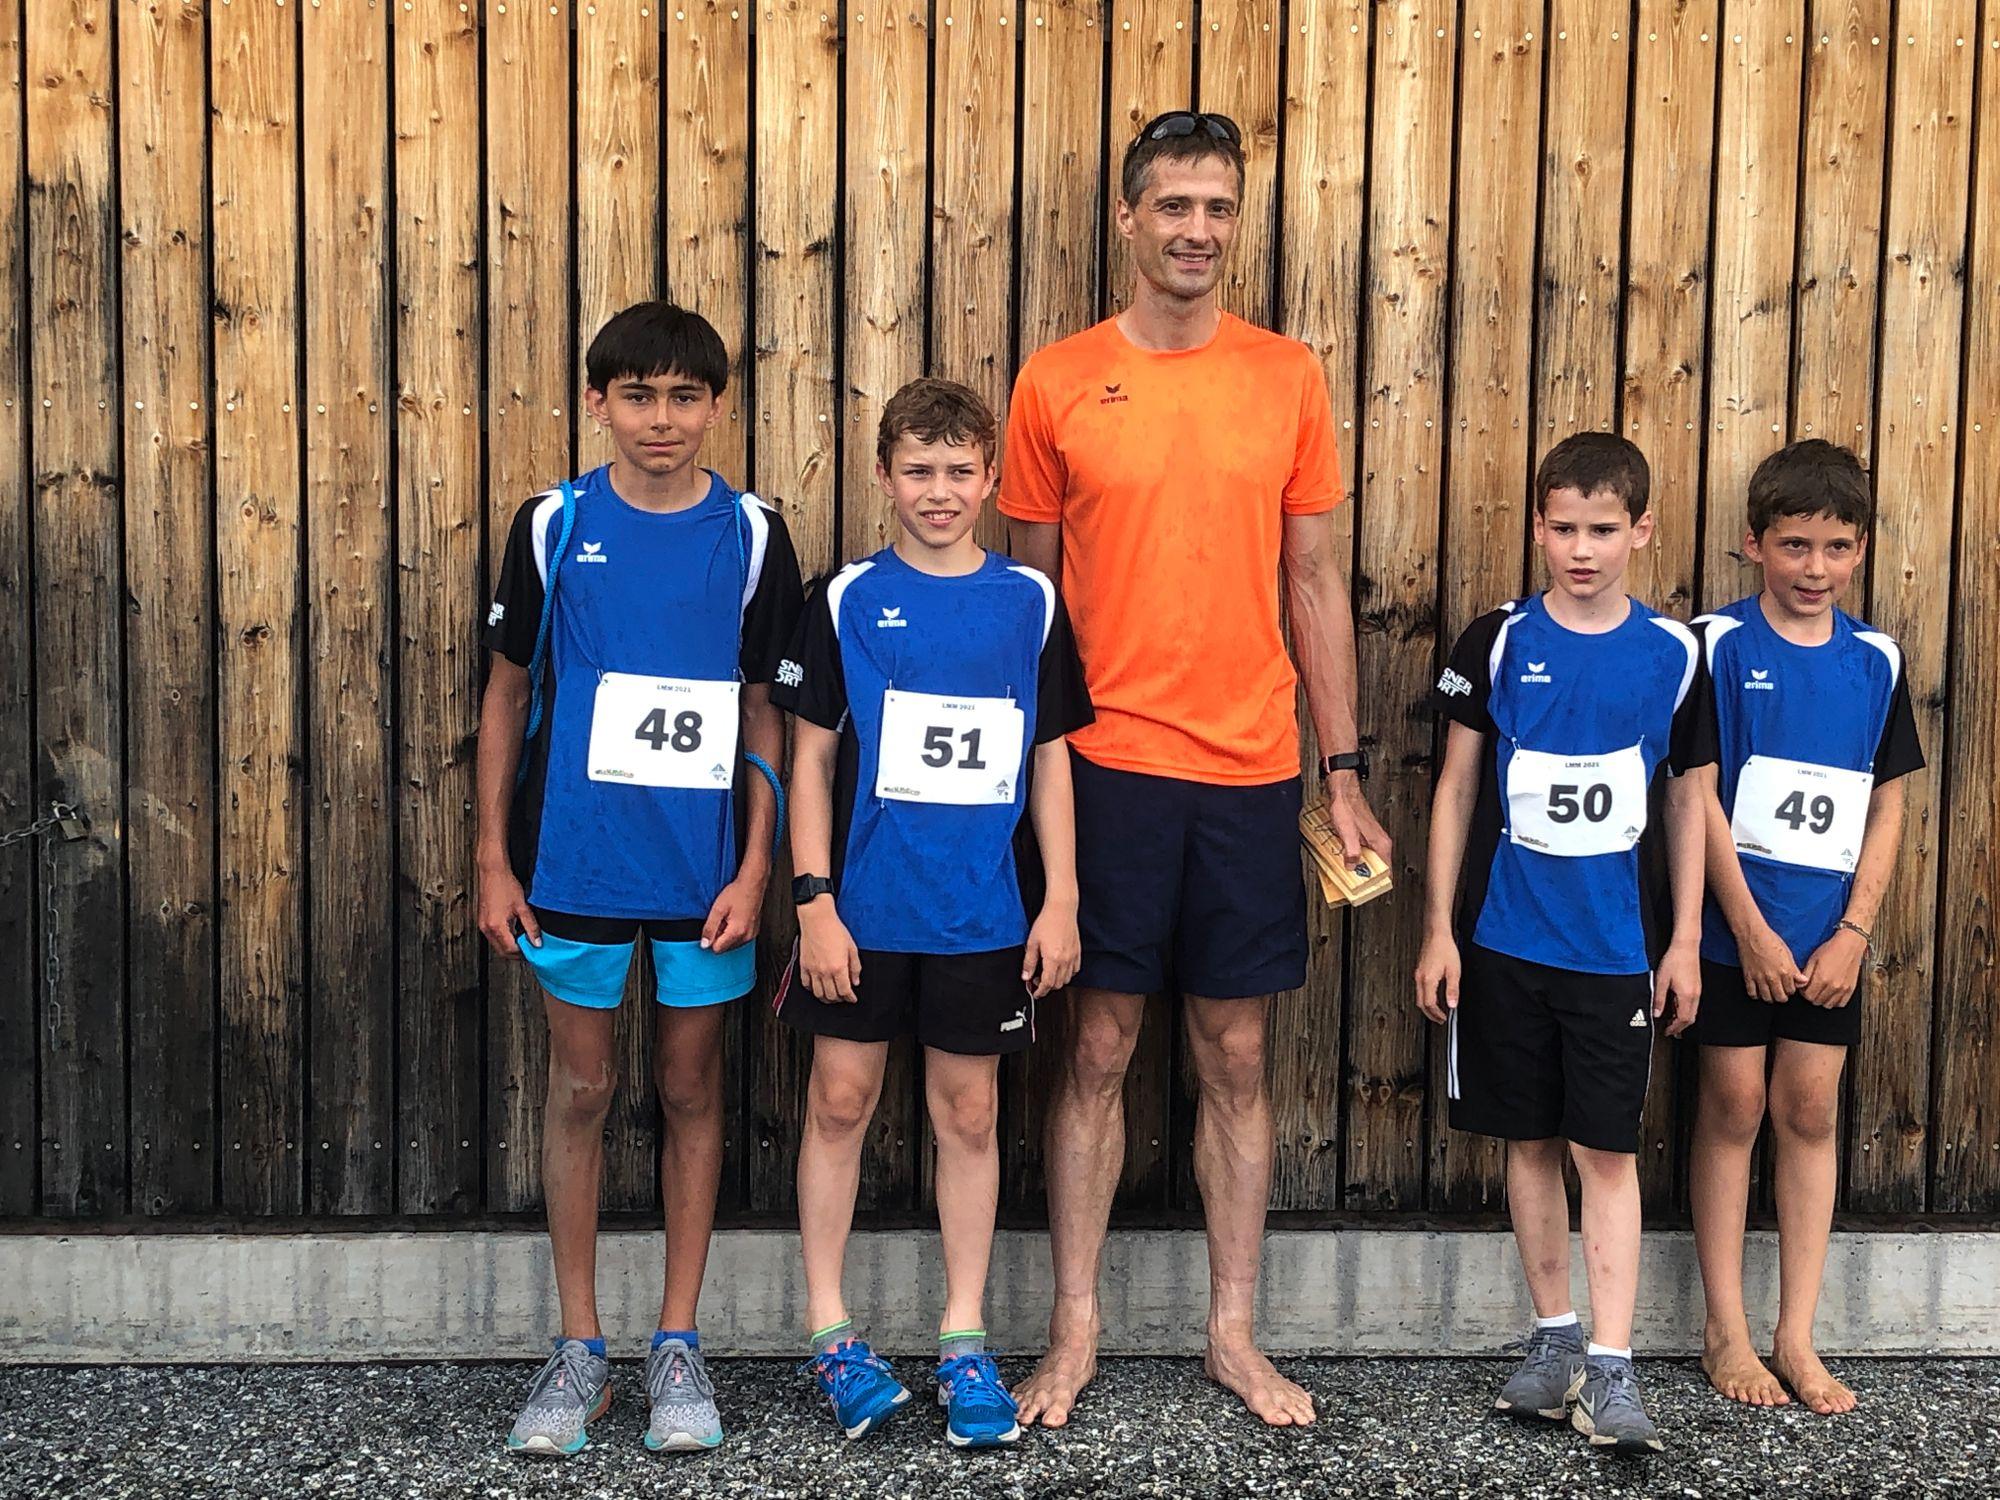 Toller Jugi Wettkampf am Kids Cup in Sargans